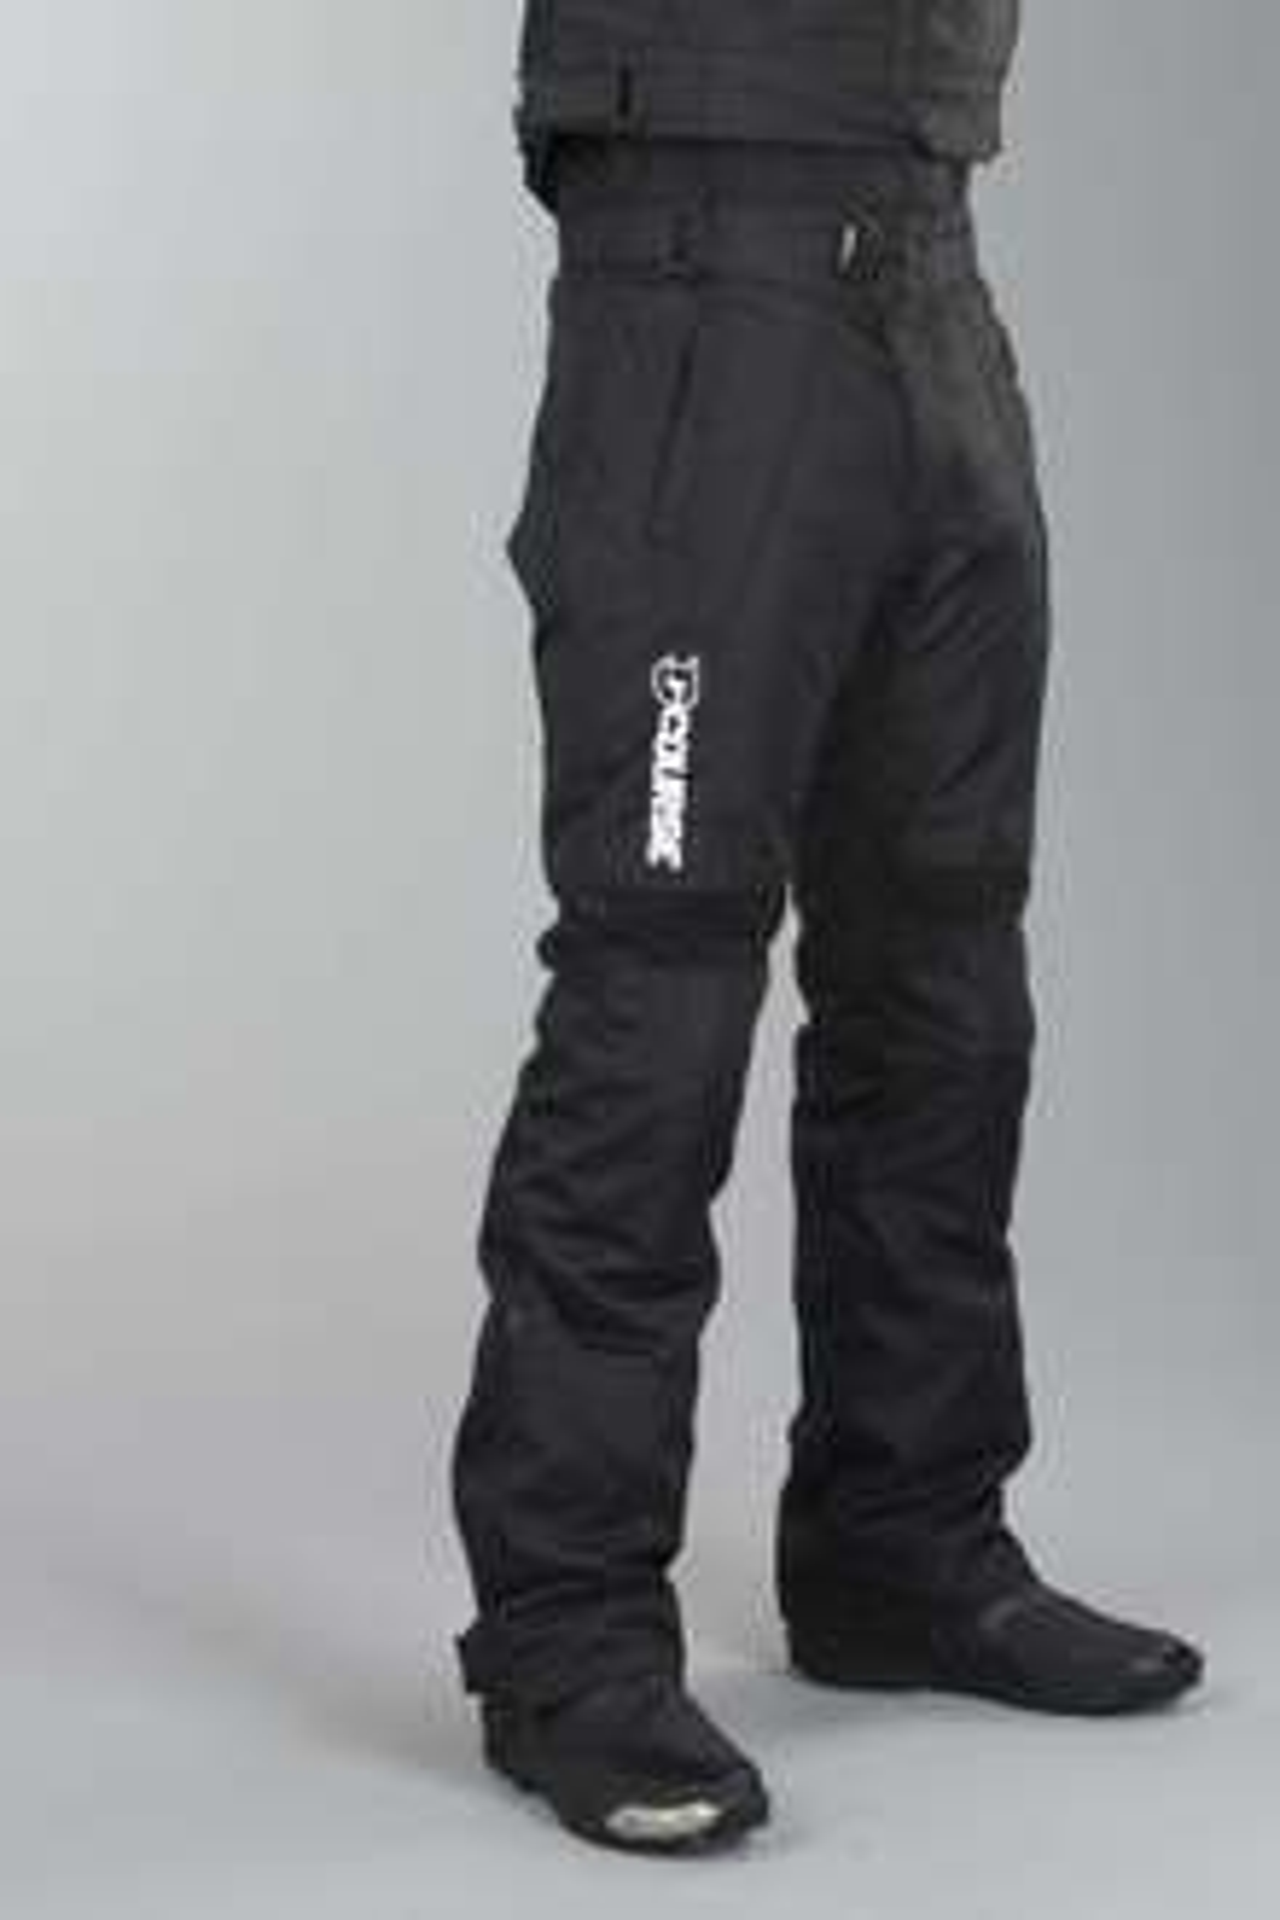 Pantalon de moto Course Two Seasons